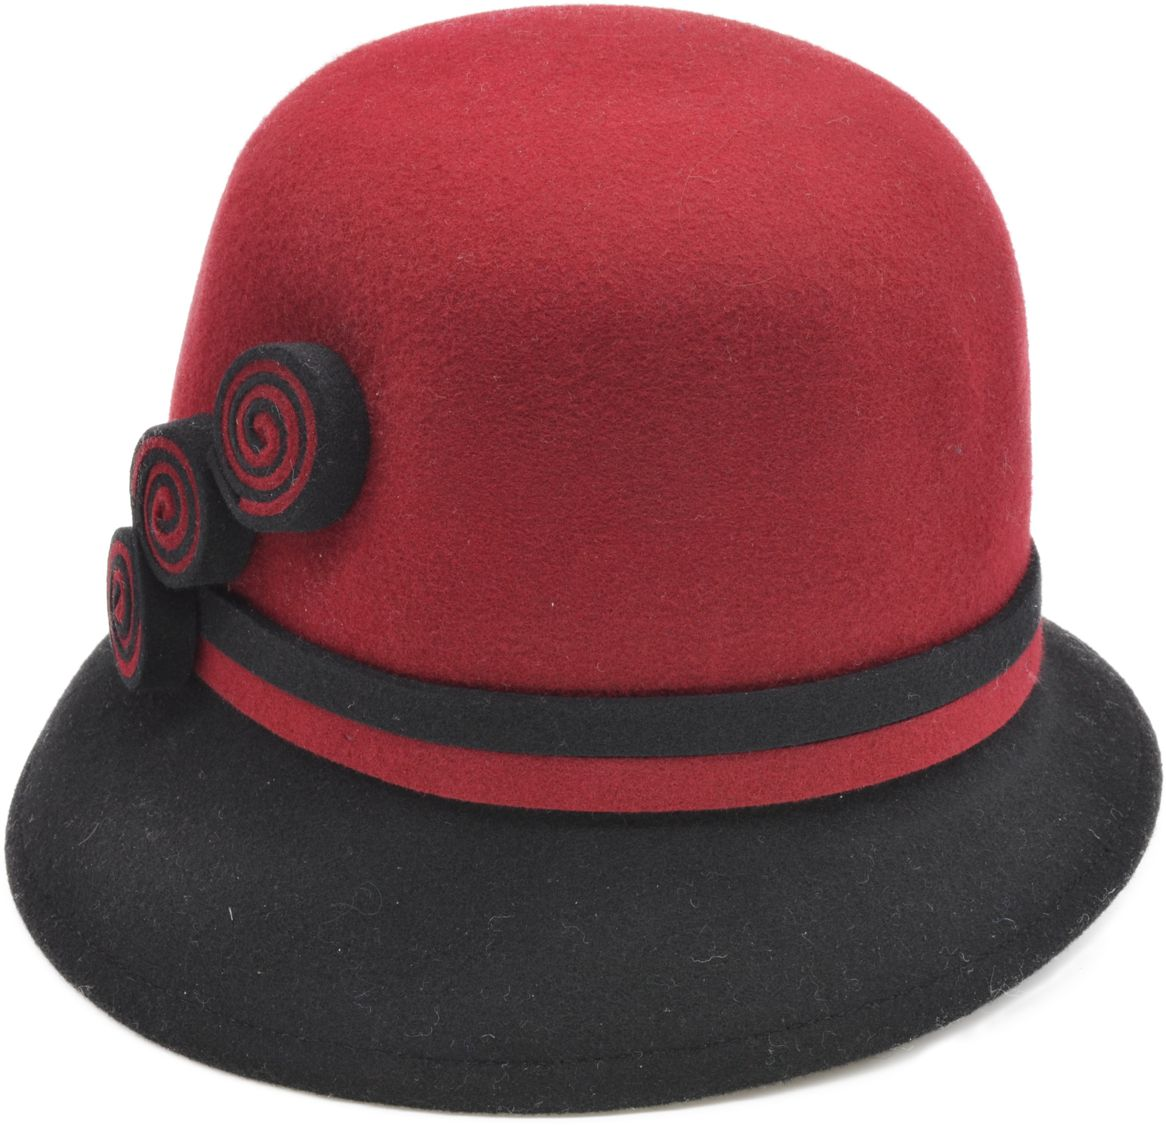 eae1726re_chapeau-cloche-pin-up-40-s-50-s-retro-glamour